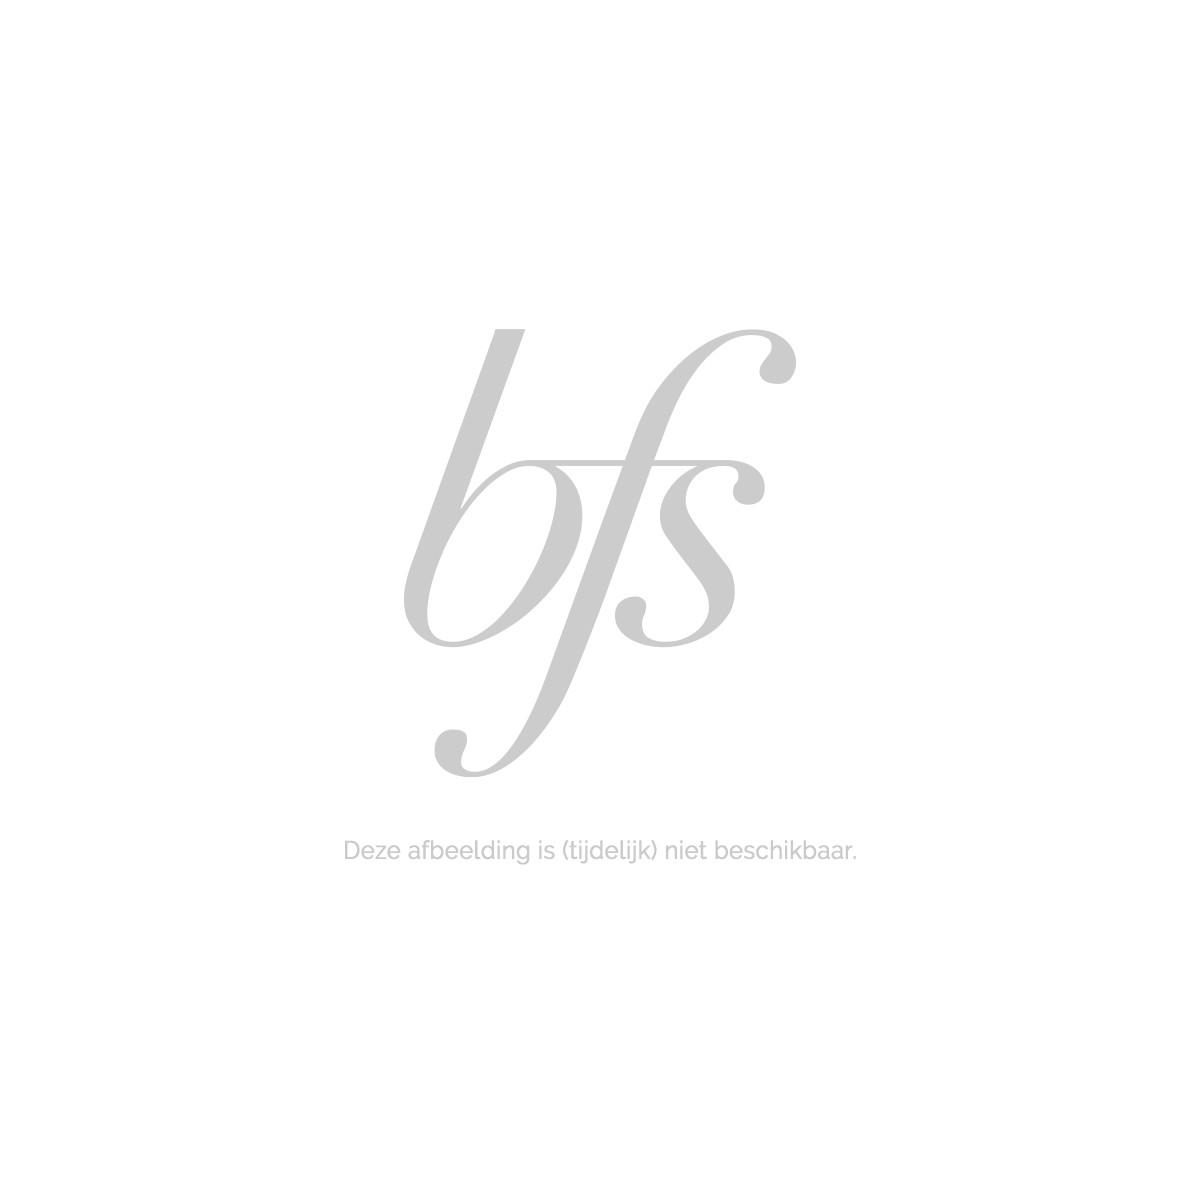 Body and Bess Facial Scrub 75 Ml